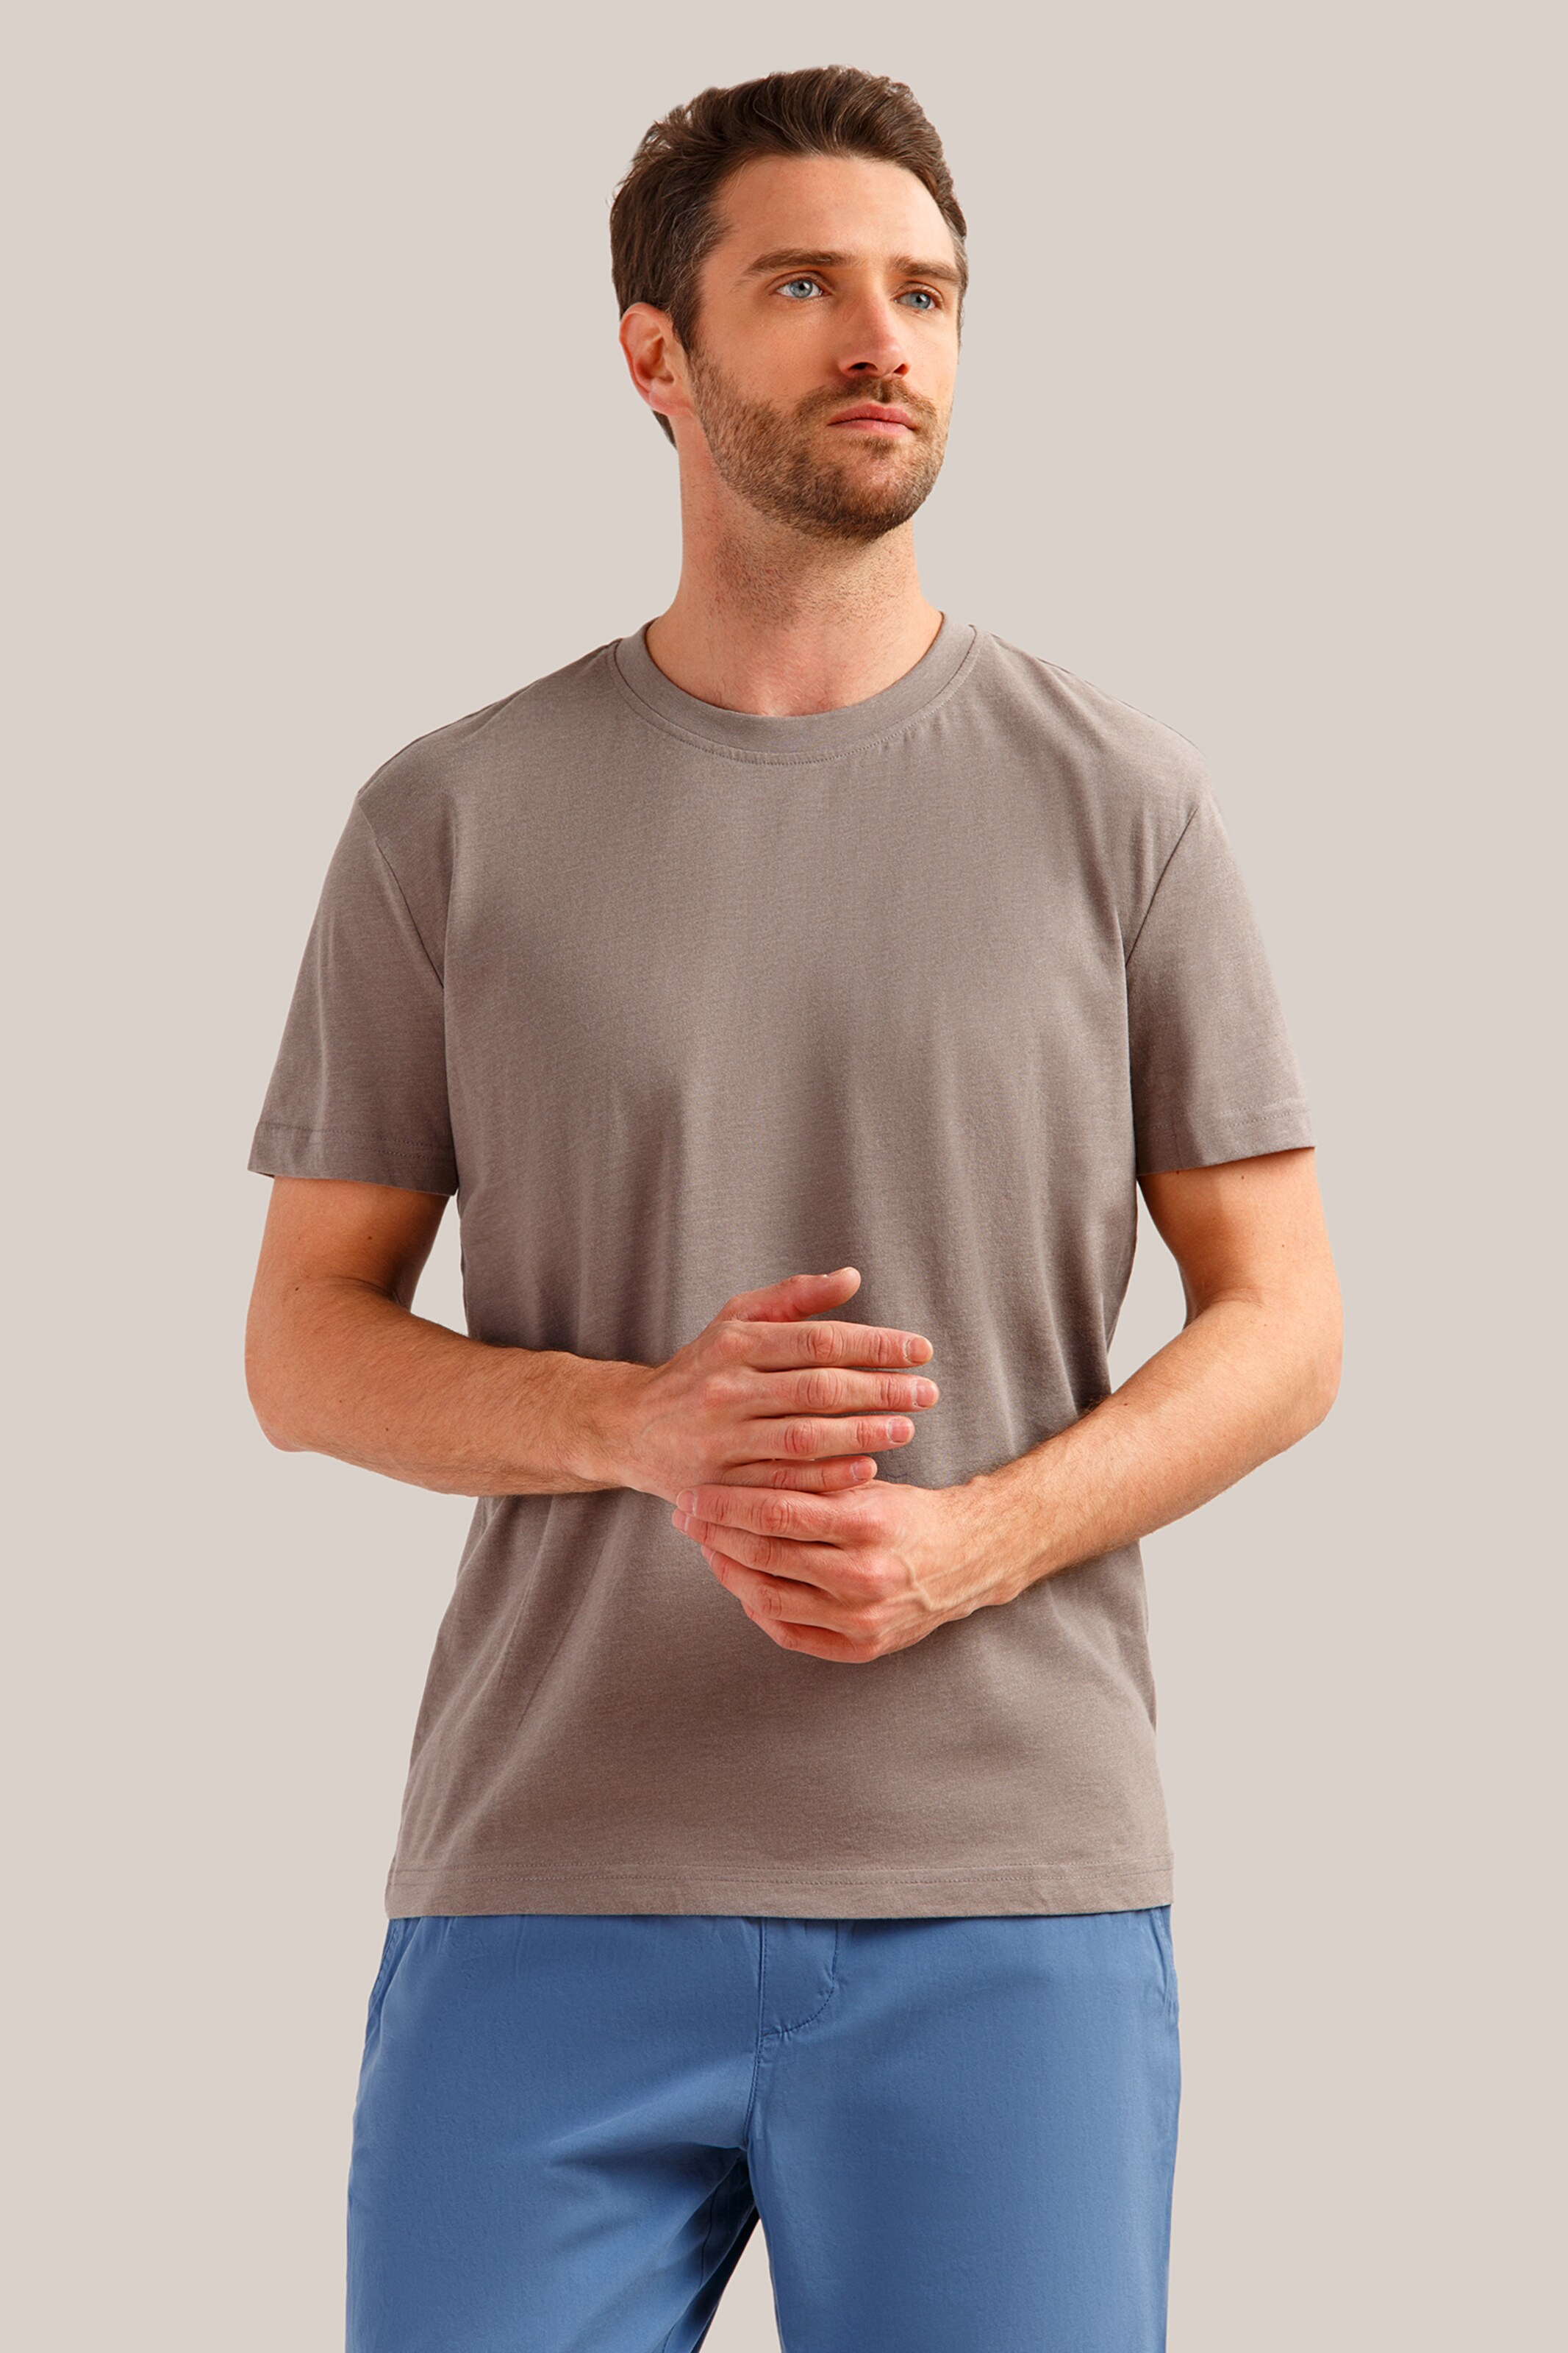 Finn shirt In Design Klassischem Braun Basic Flare 0Xk8OwnP